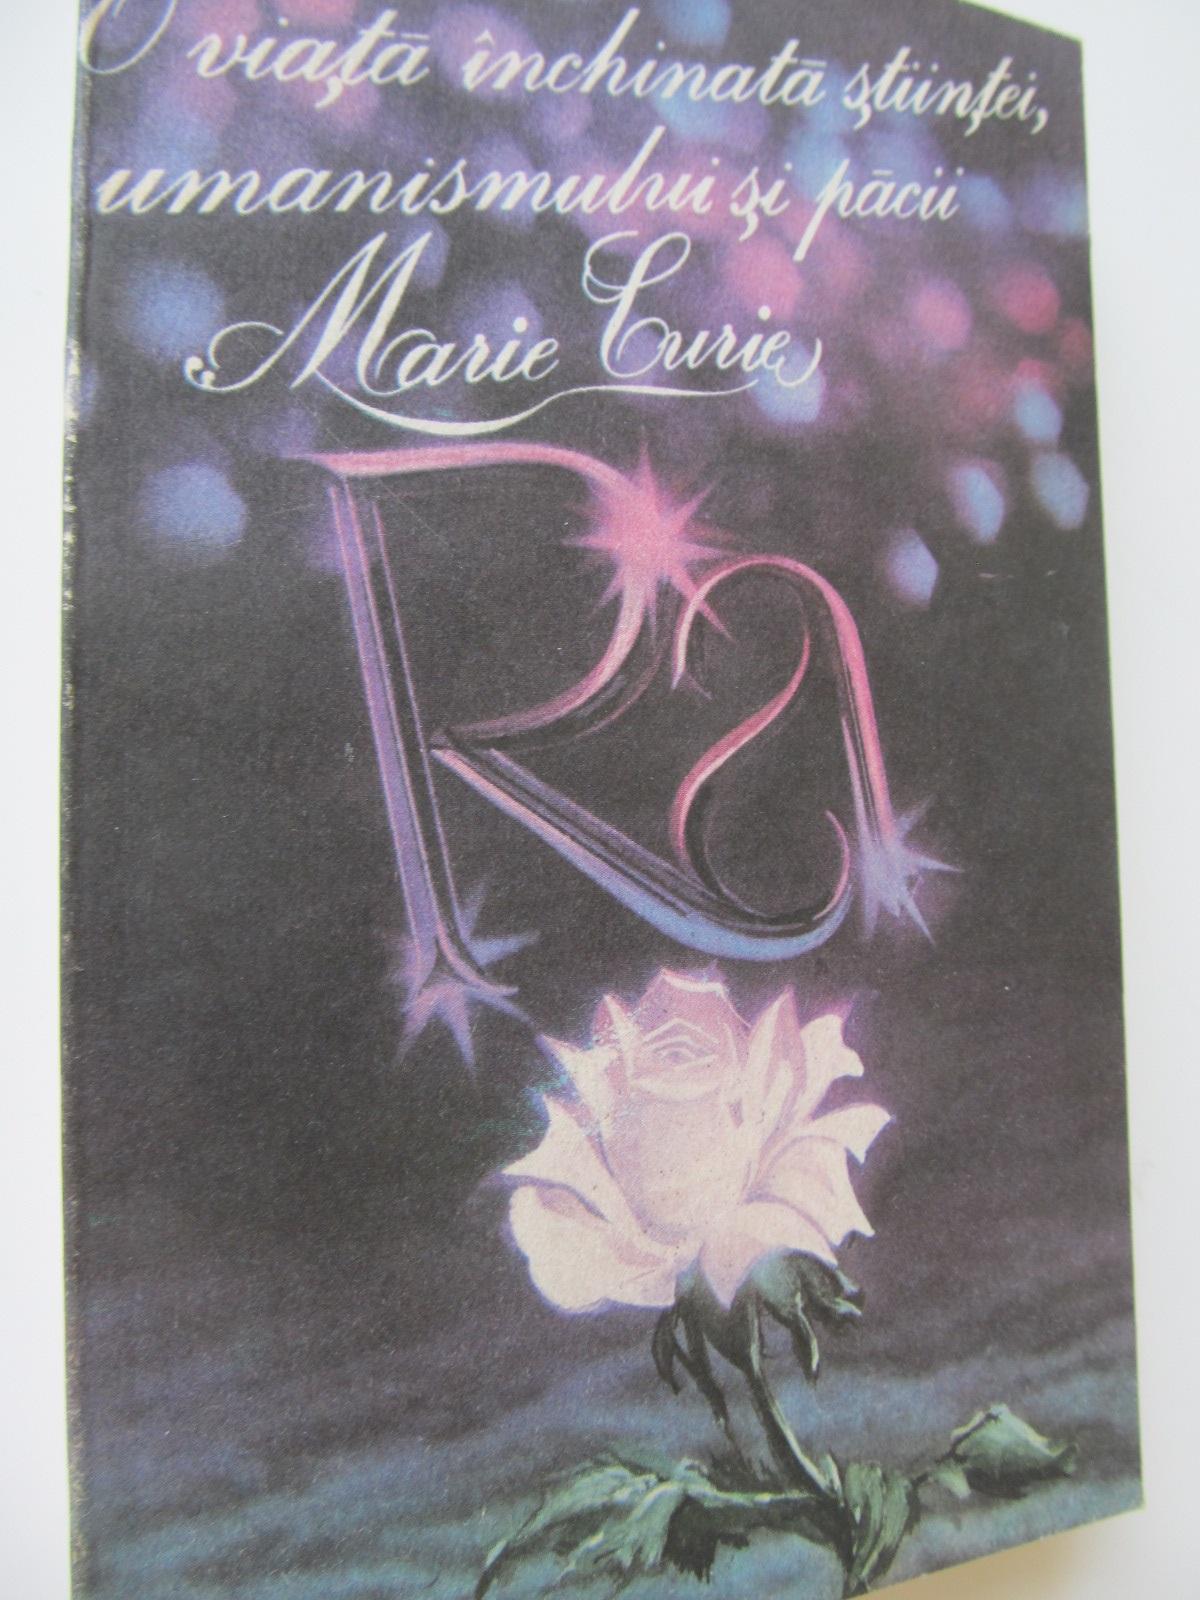 Marie Curie - O viata inchinata stiintei, umanismului si pacii - Eve Curie | Detalii carte